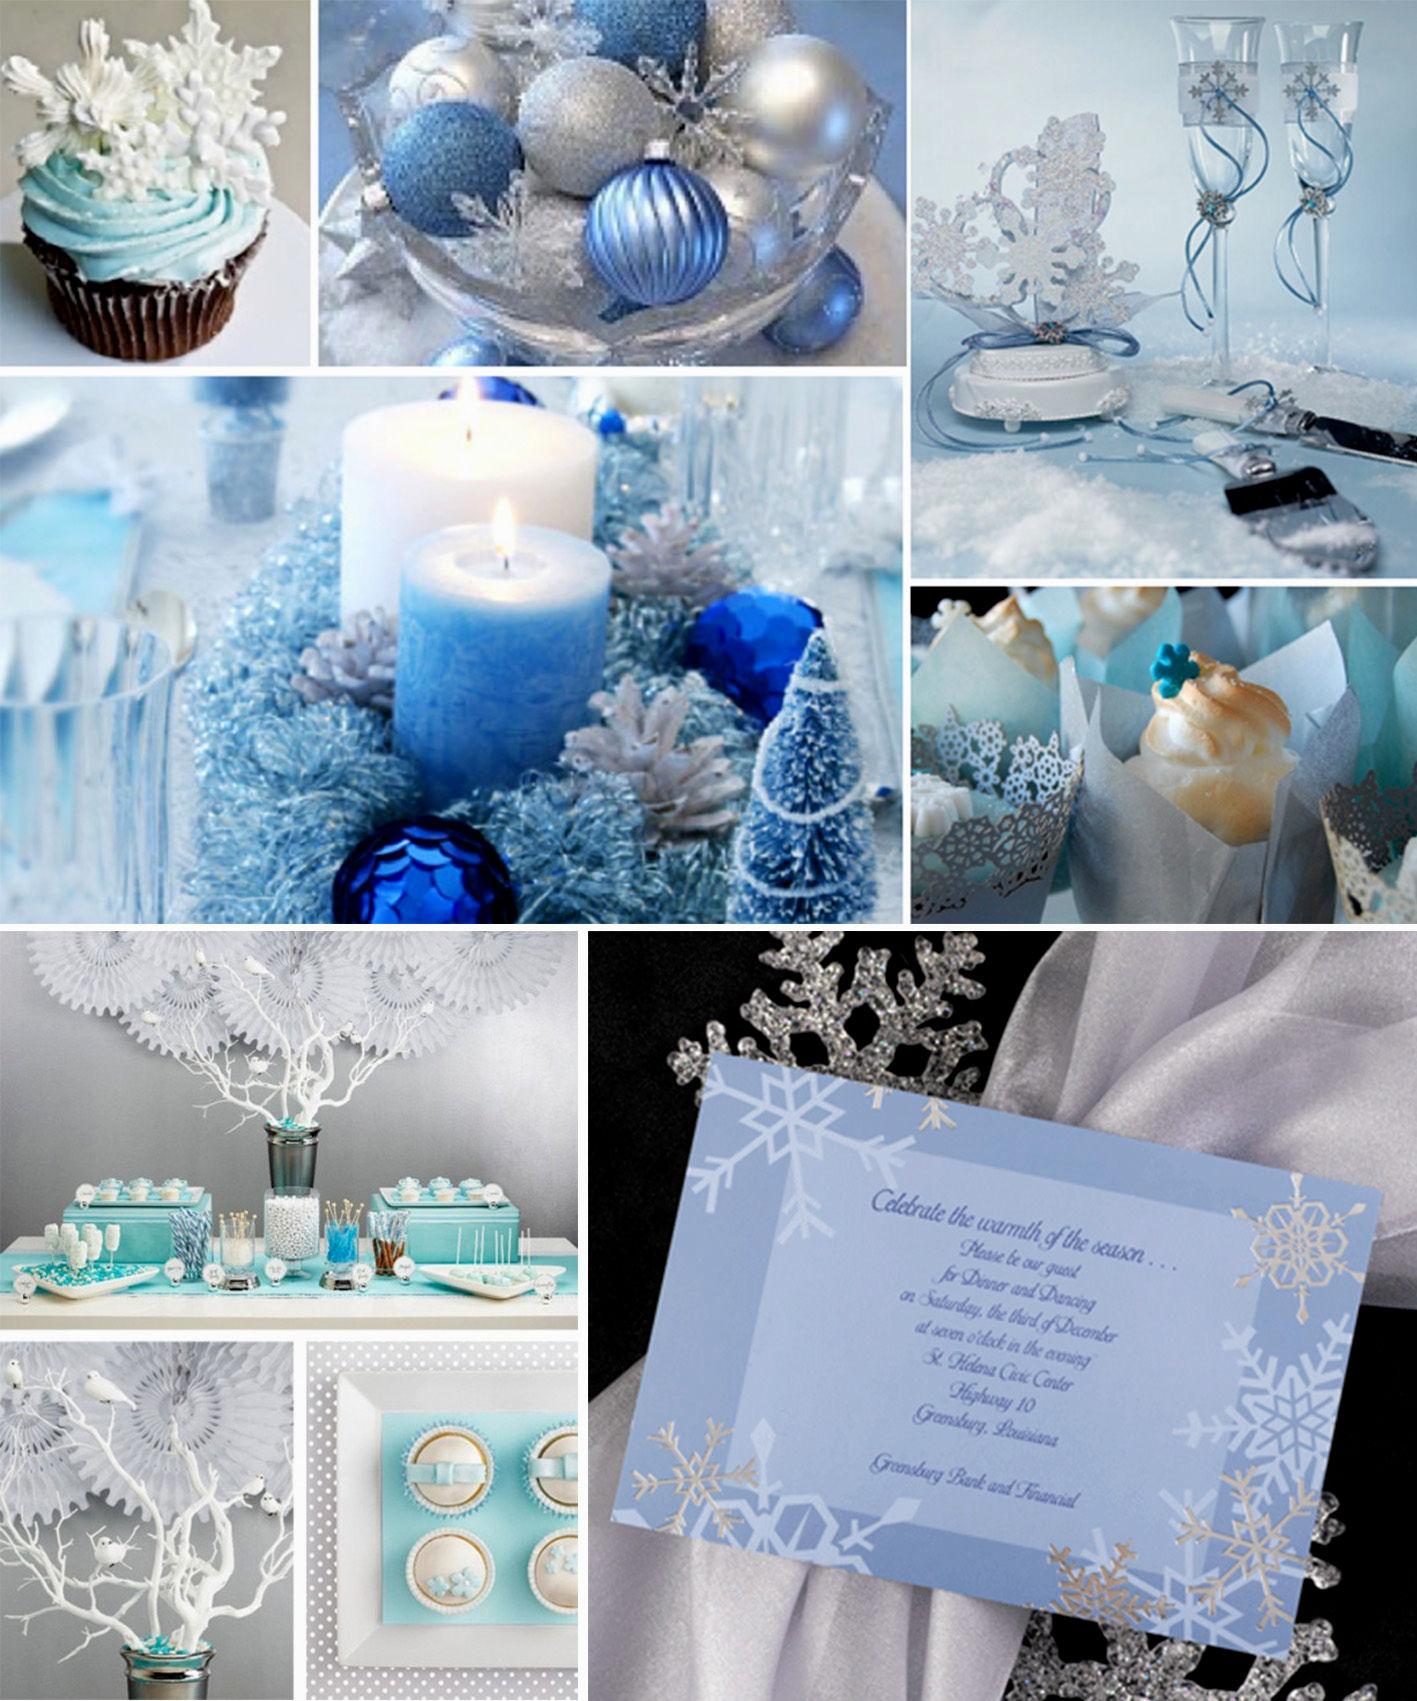 Winter Home Decor Ideas-party-theme-ideas-for-winter-party-theme-for-winter